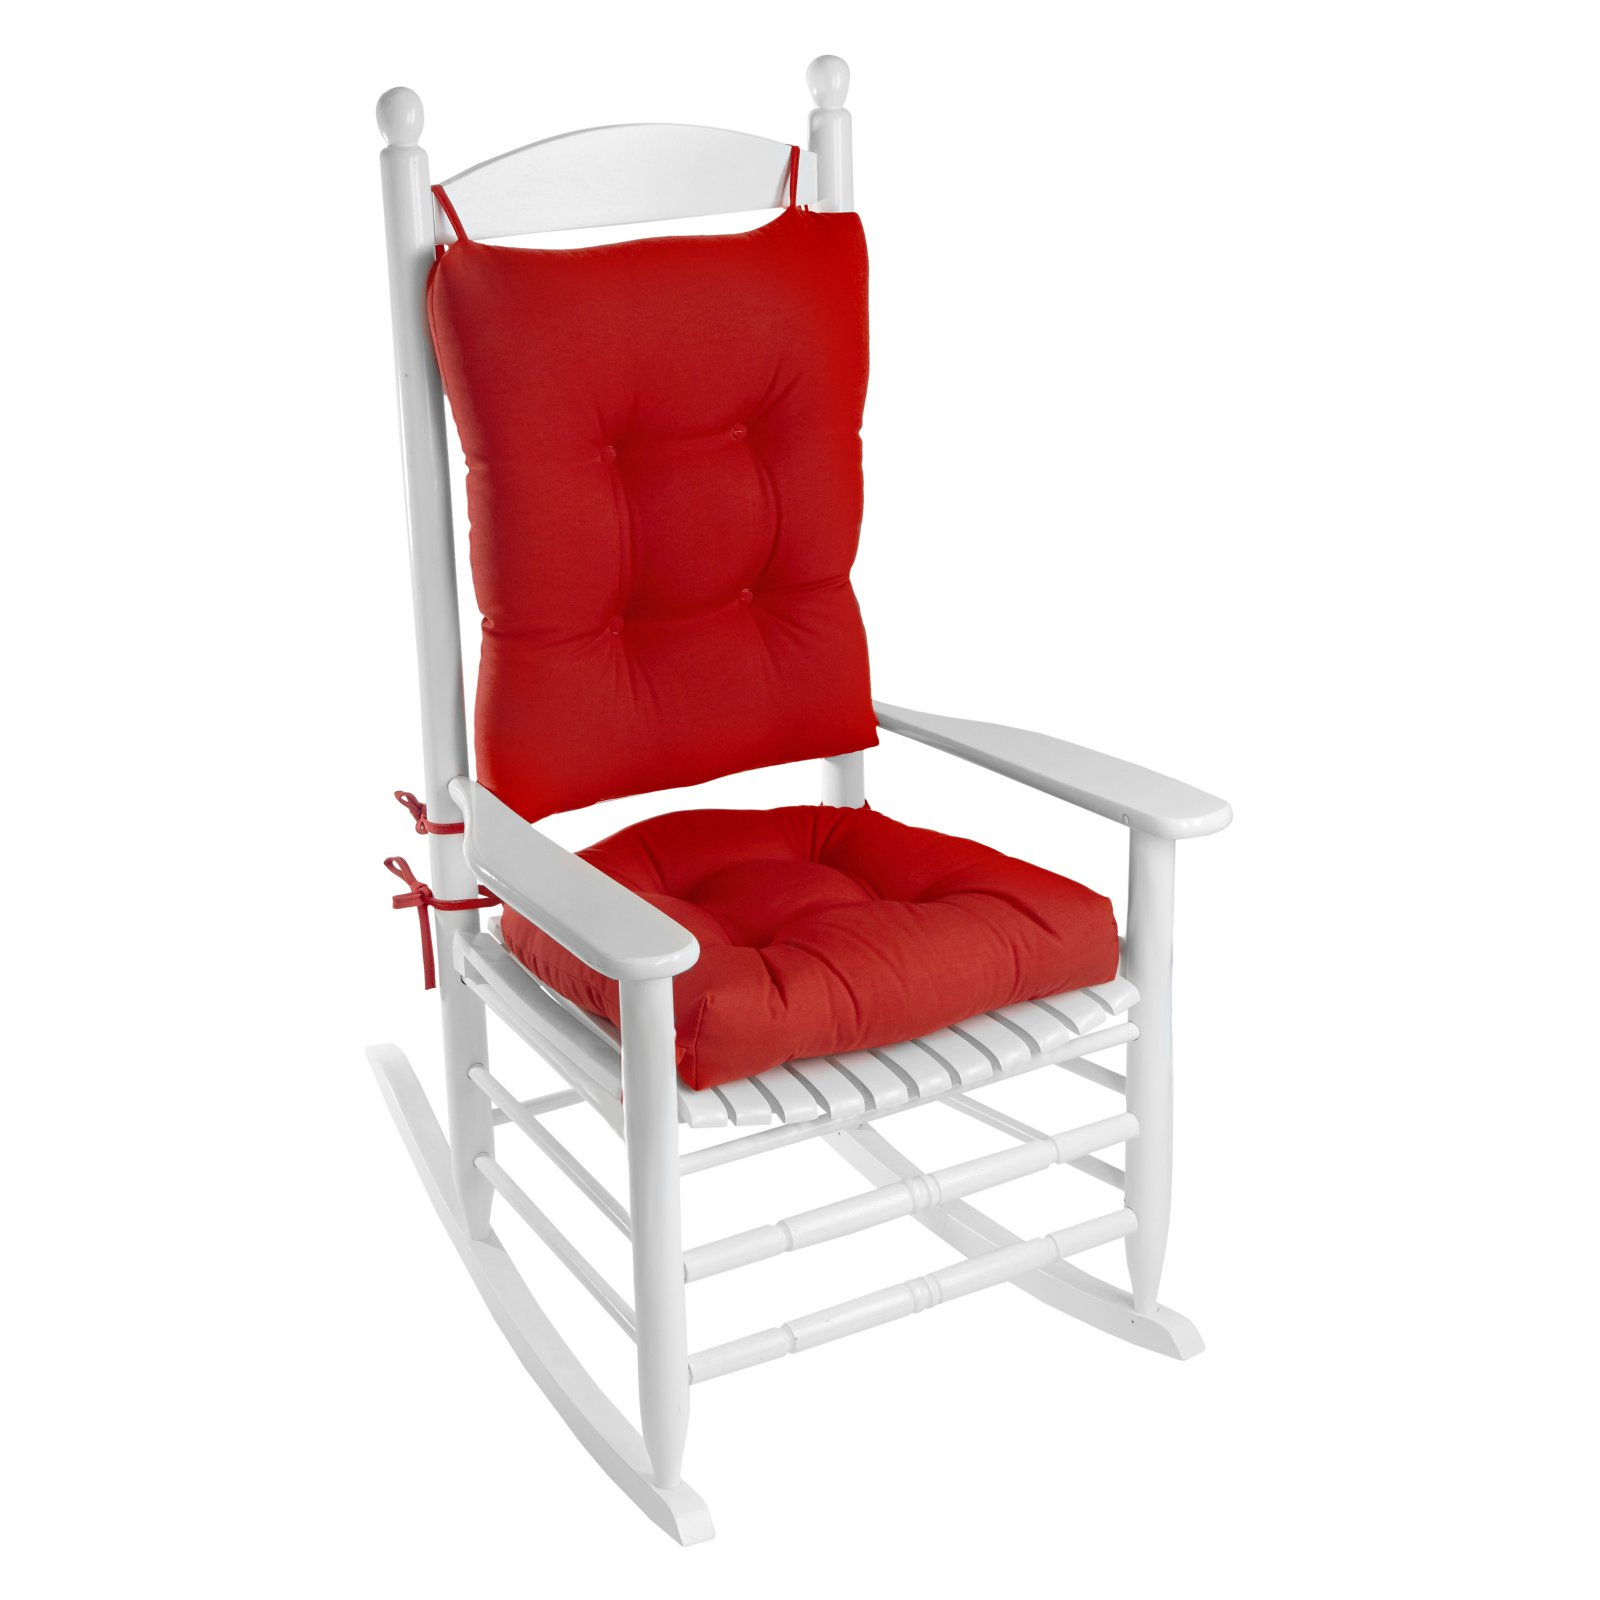 Image of: Porch Outdoor Indoor Red Rocking Chair Cushion Set Walmart Com Walmart Com